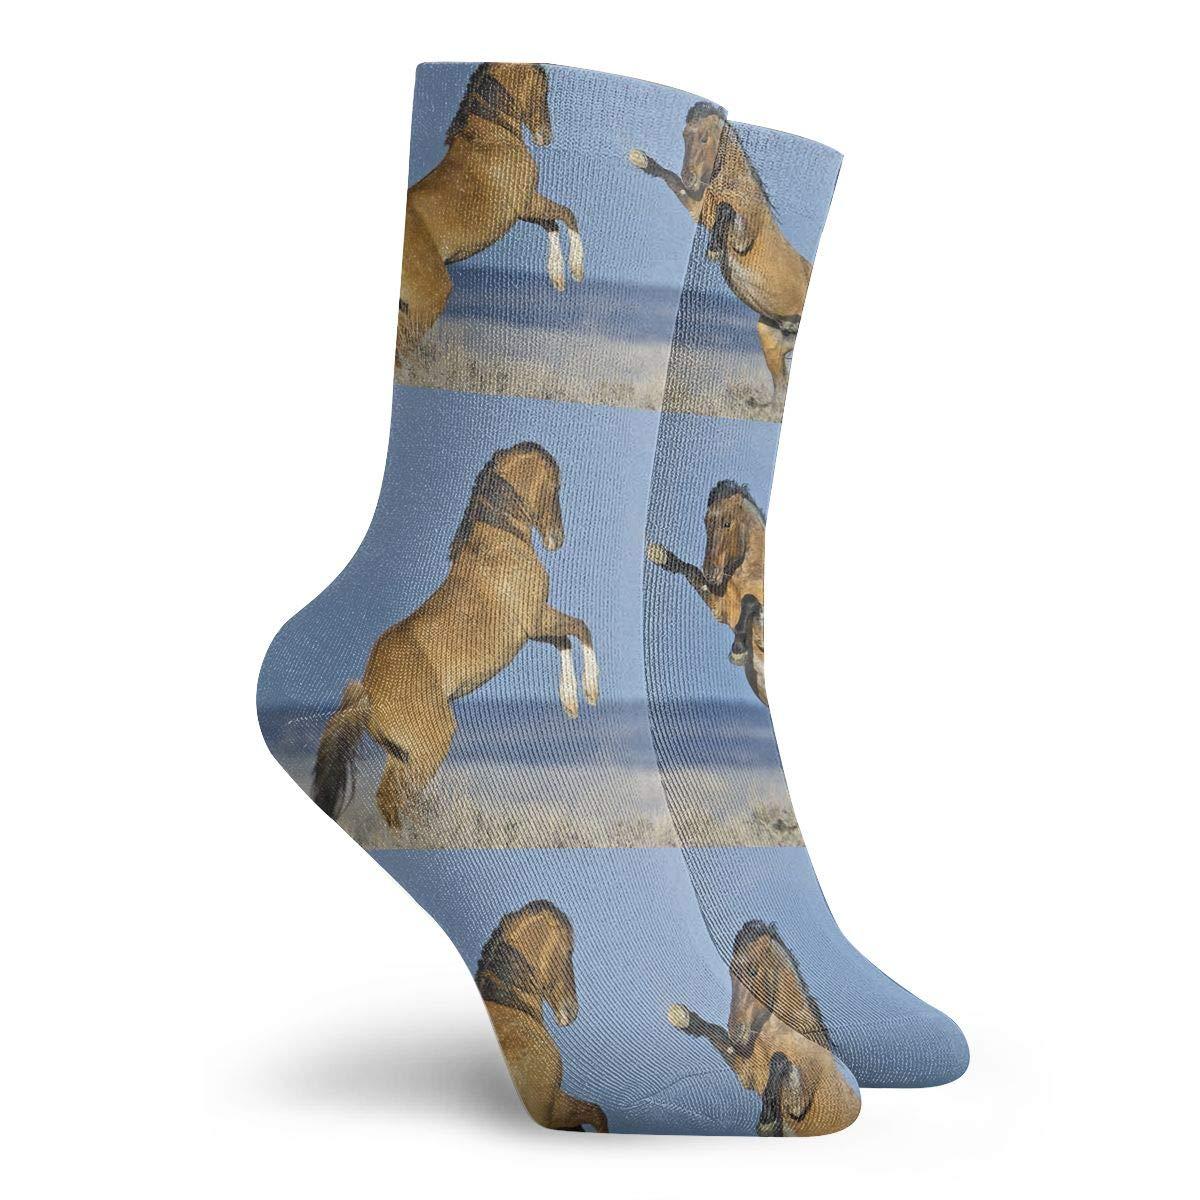 Wild Horse Mens Fashion Dress Socks Short Socks Leisure Travel 11.8 Inch